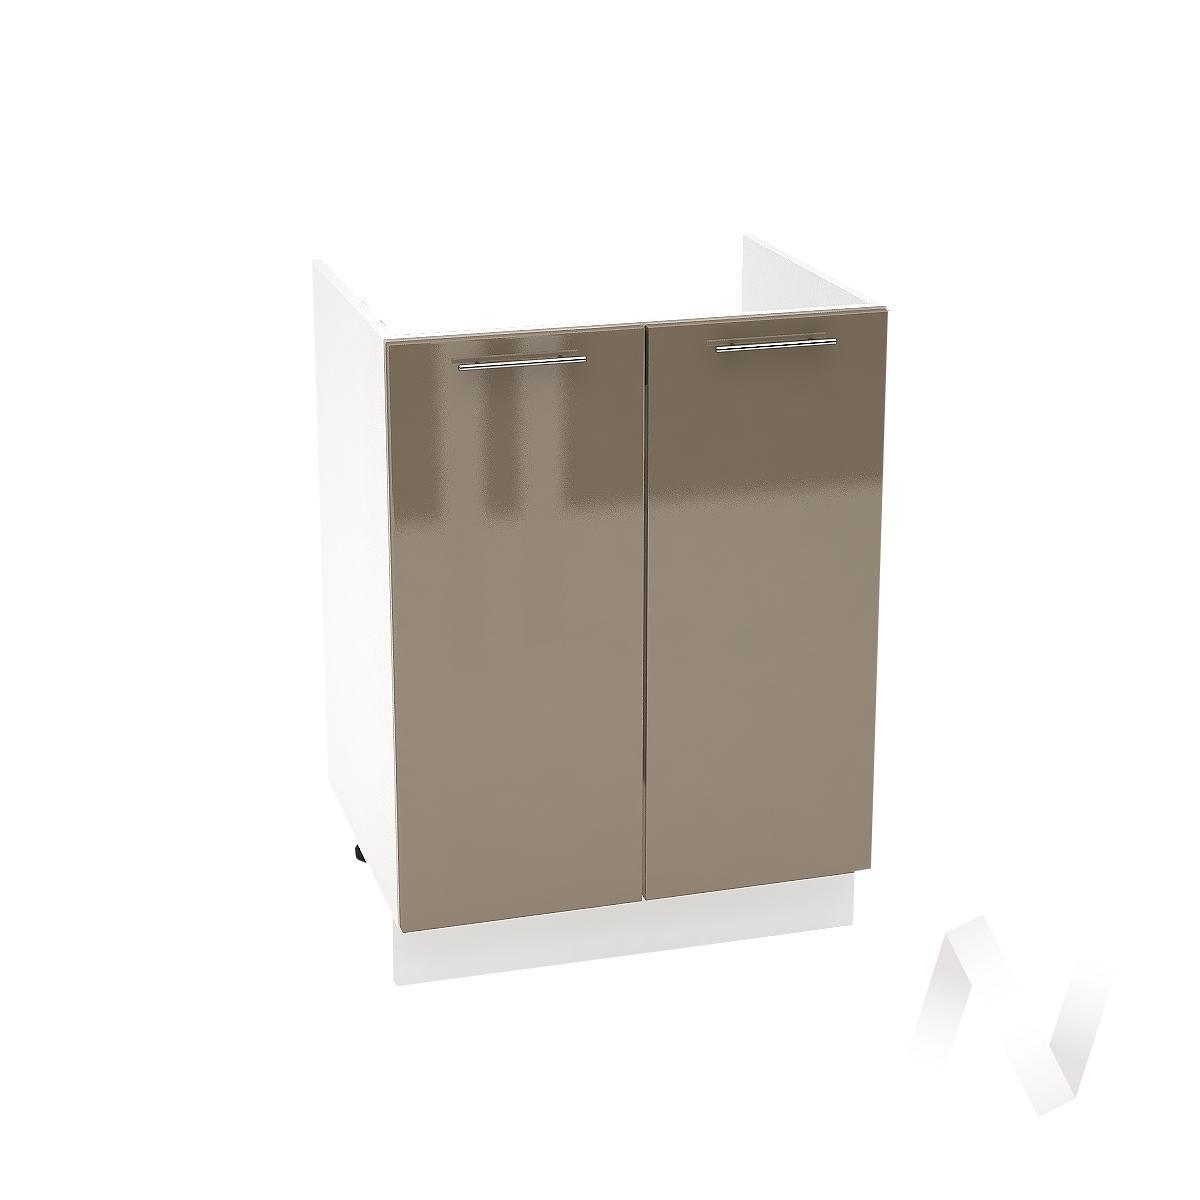 "Кухня ""Валерия-М"": Шкаф нижний под мойку 600, ШНМ 600 (Капучино глянец/корпус белый)"